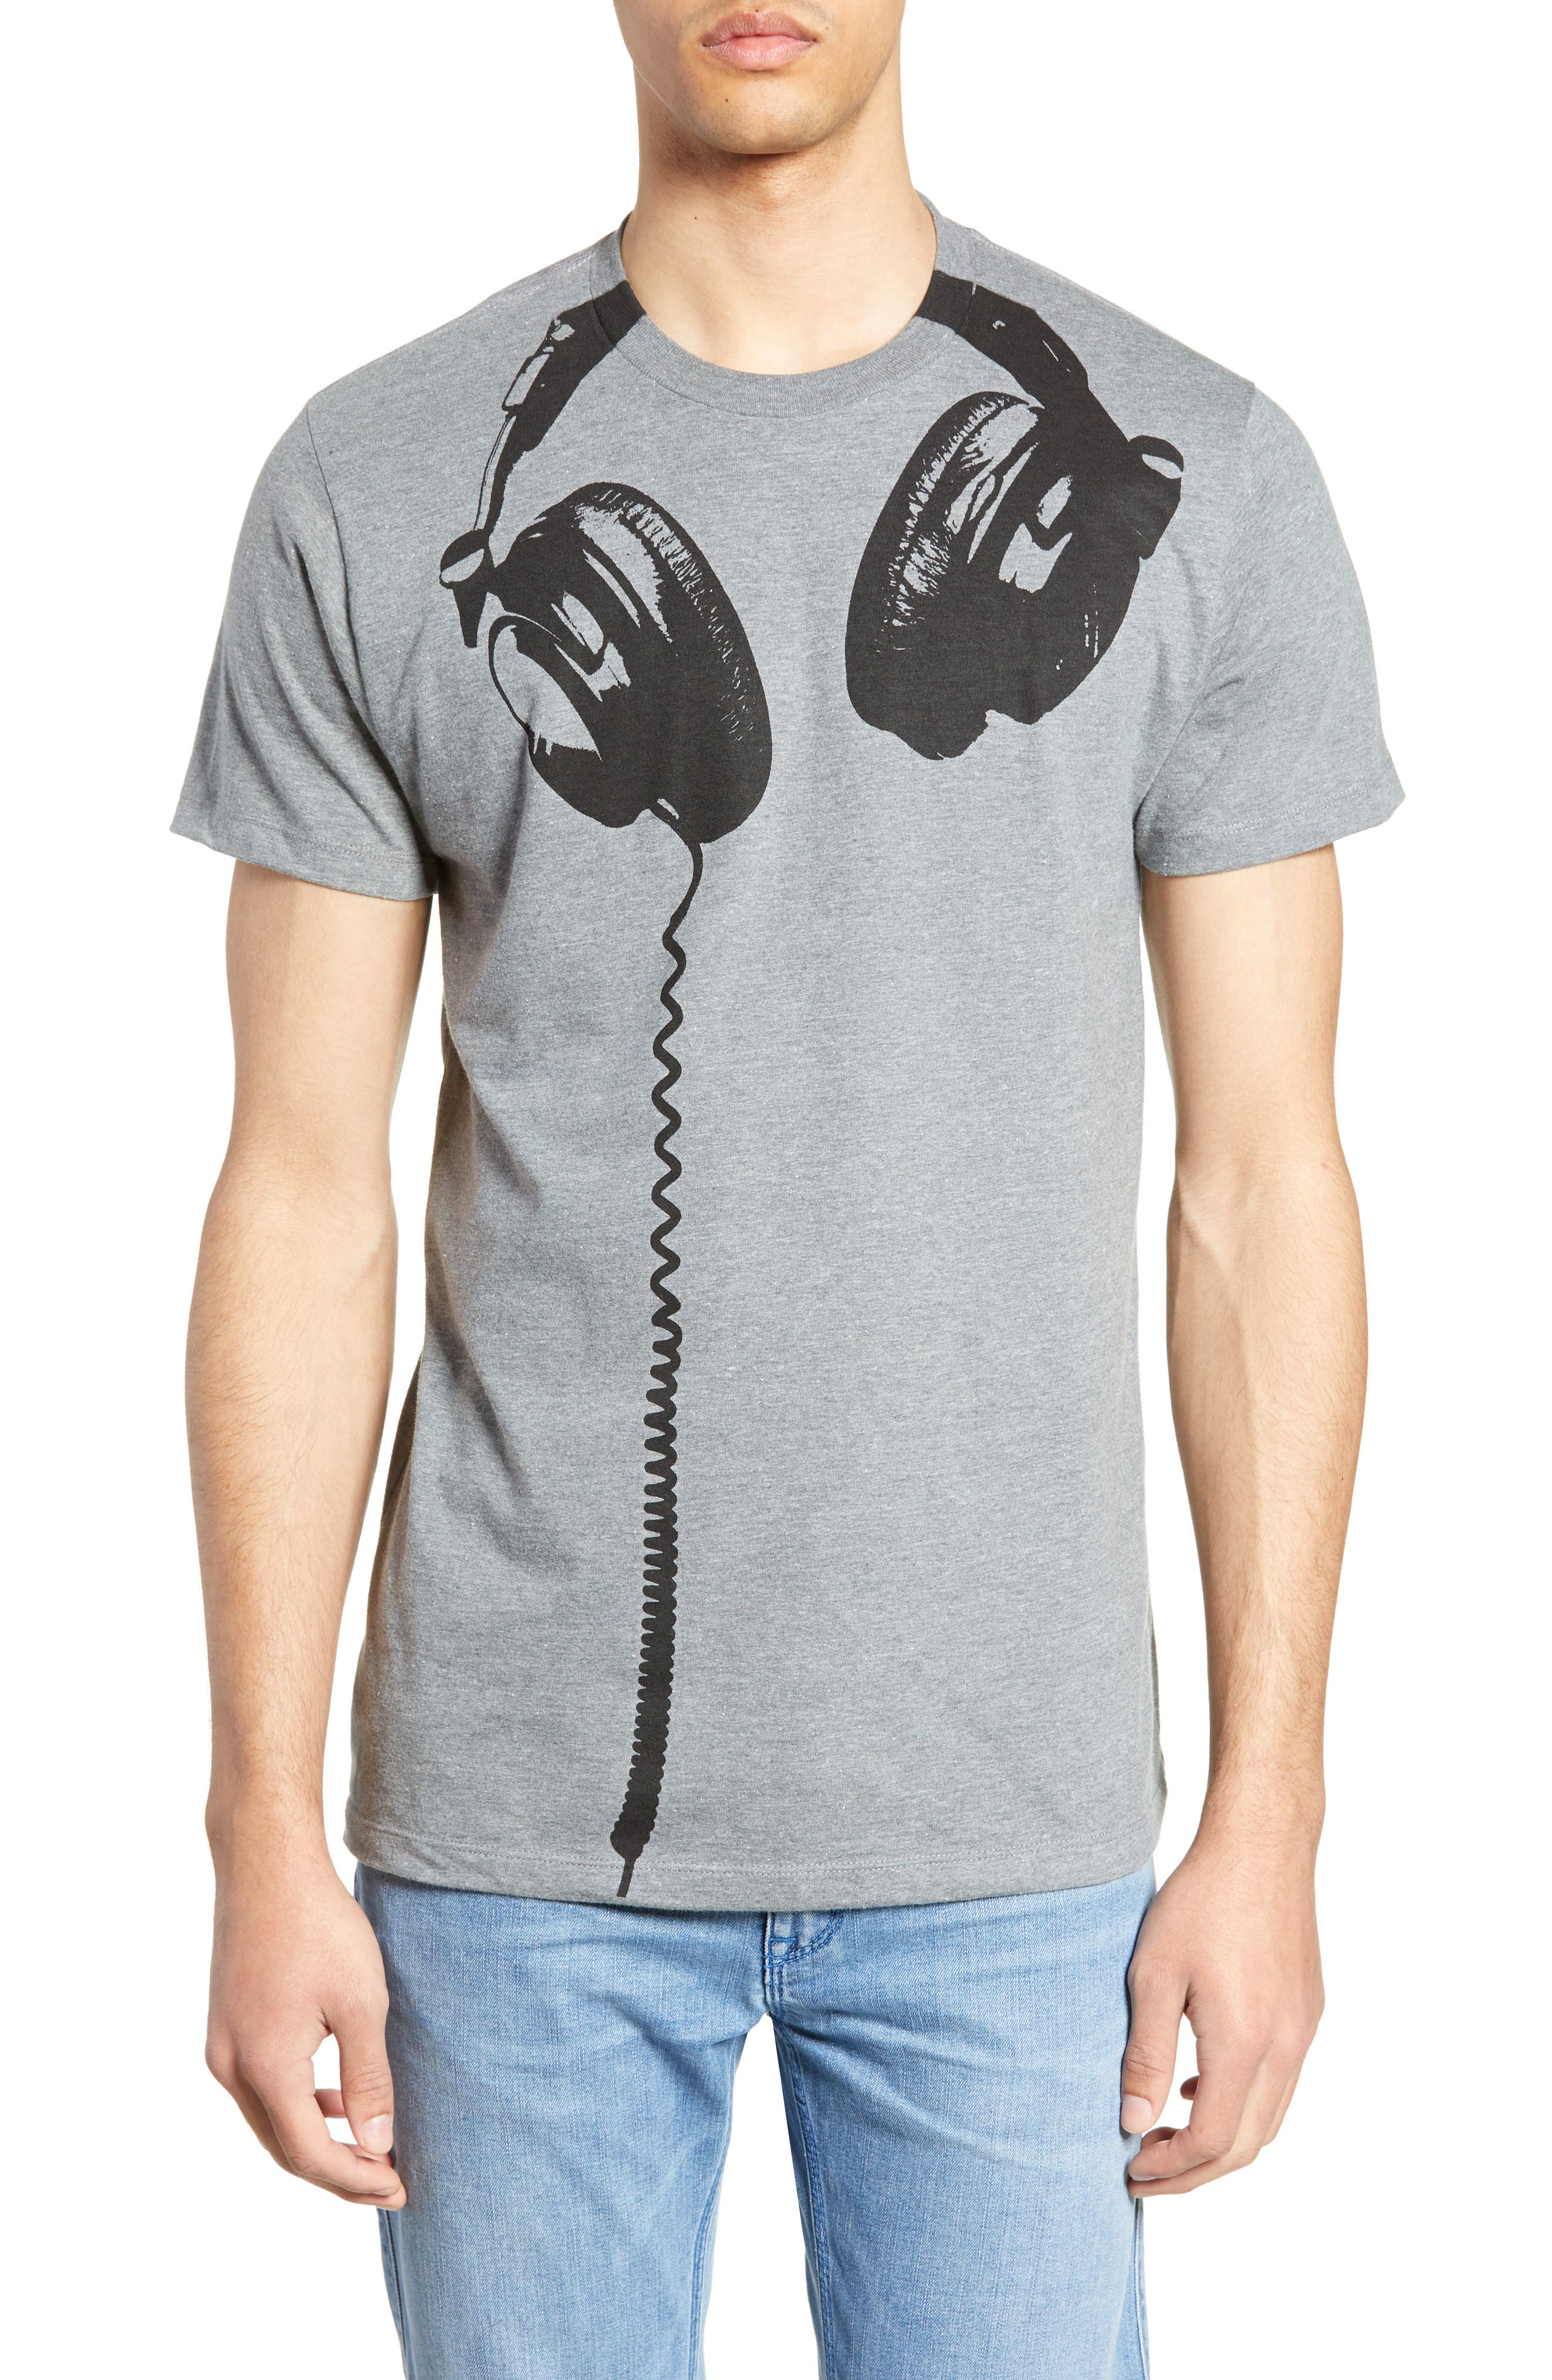 Impact Merchandising Headphones Graphic T-Shirt, Grey